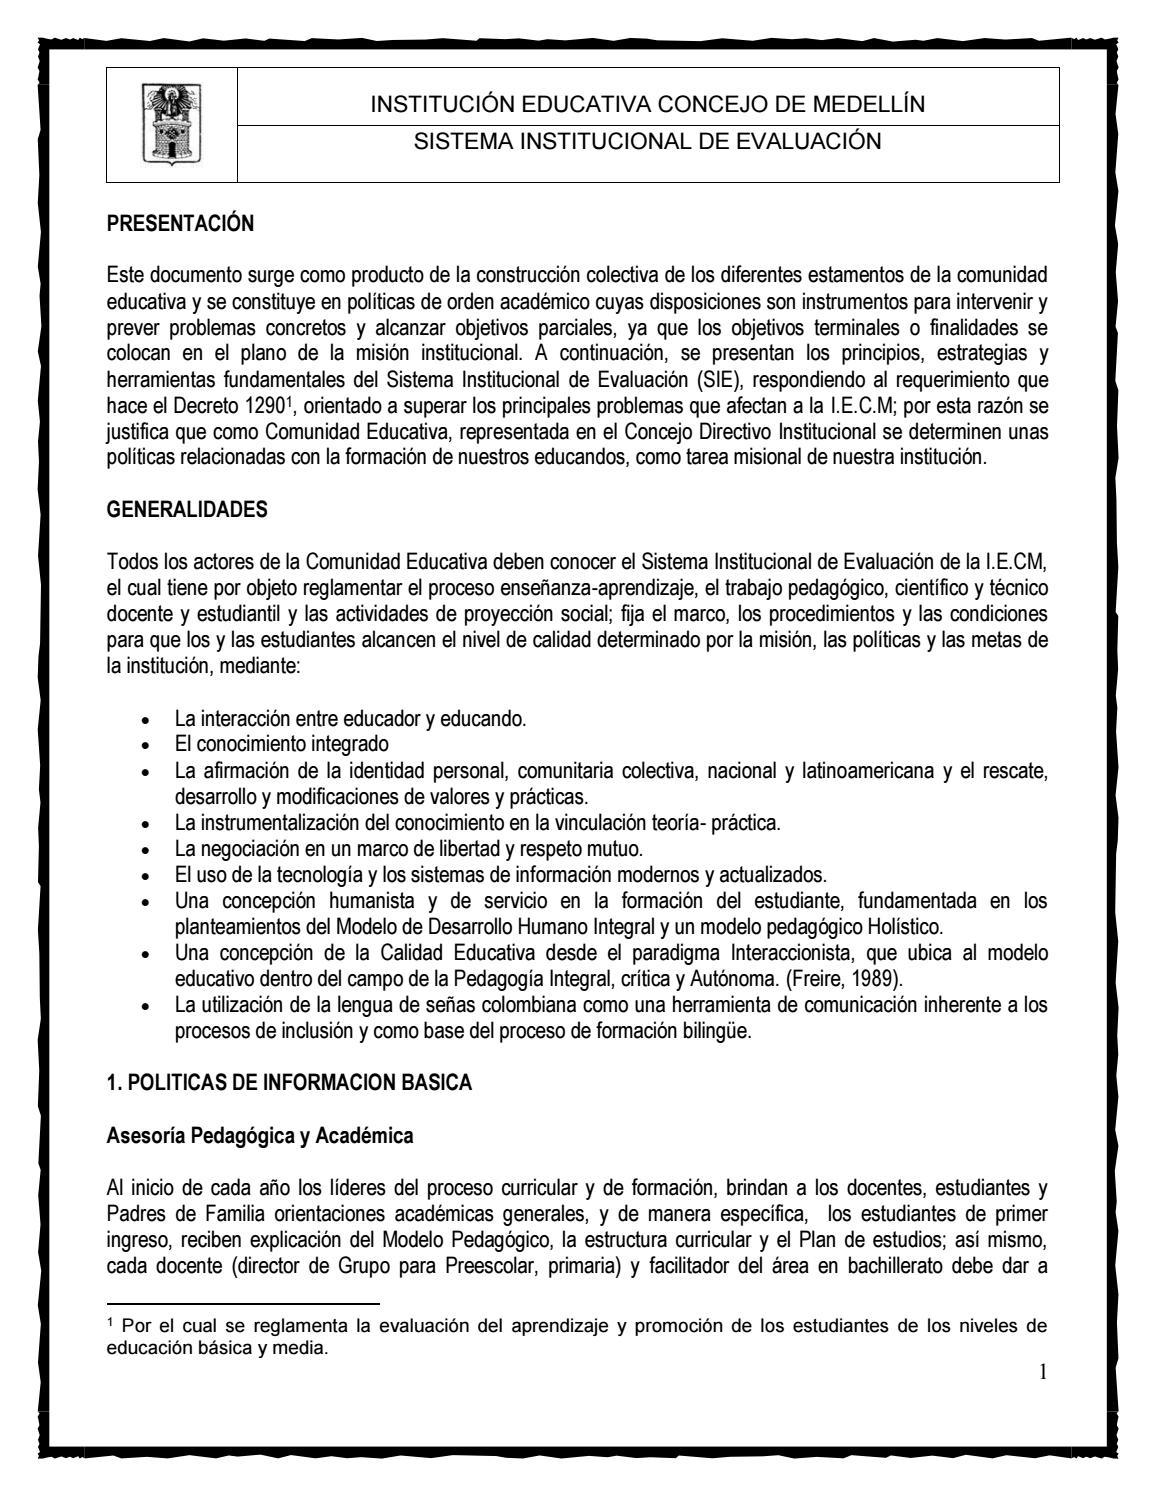 Sie Ie Concejo De Medellin By Diego Diaz Issuu